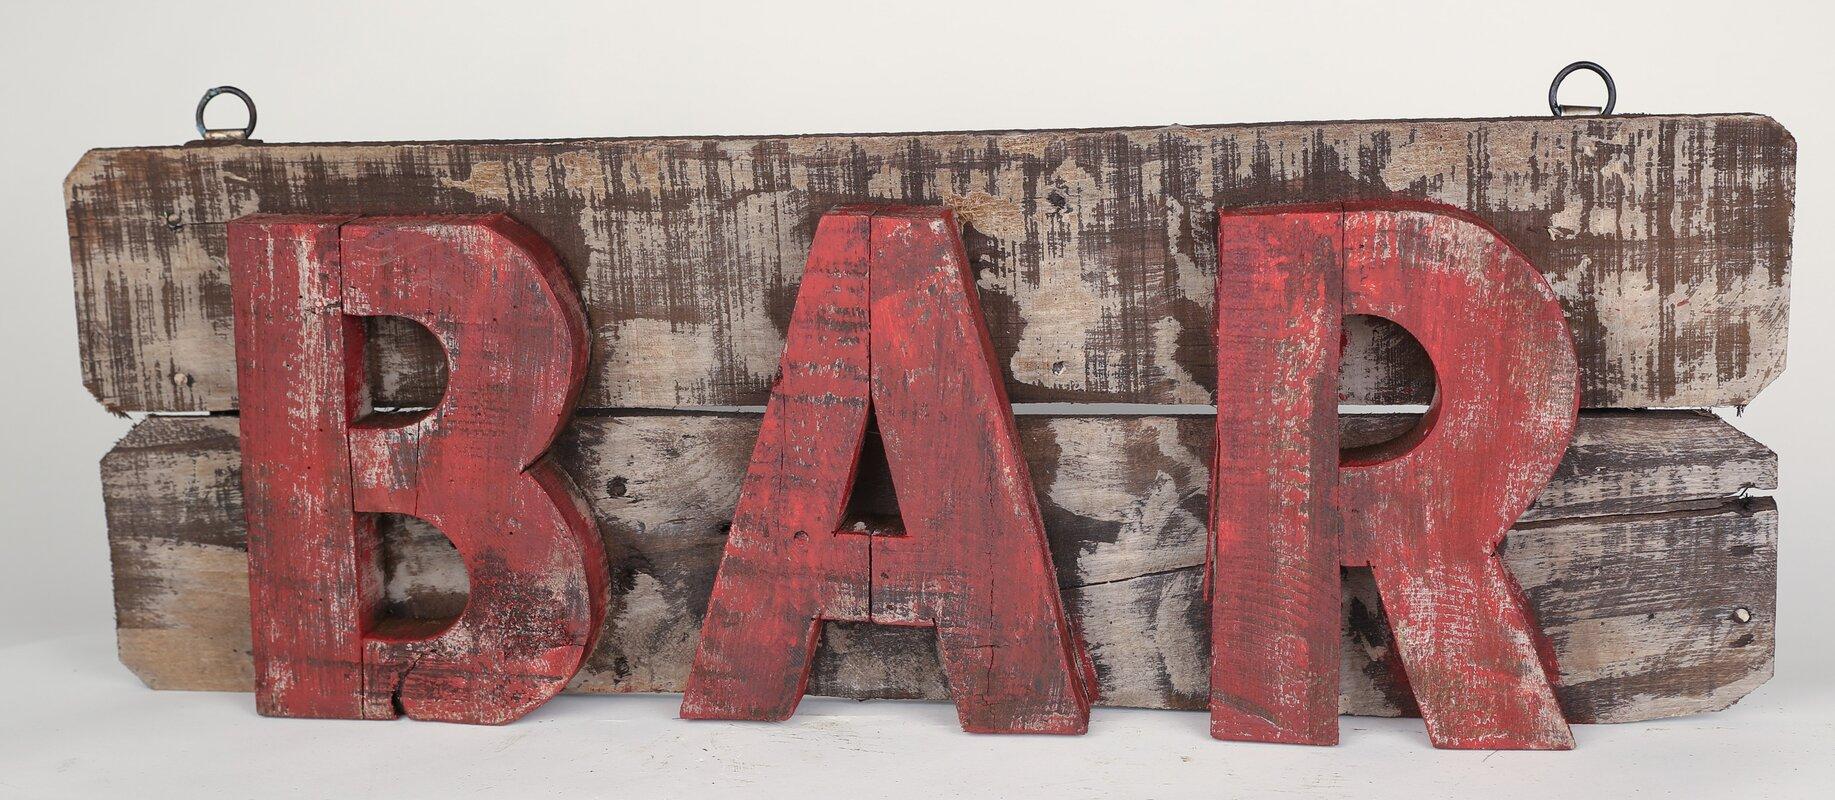 Bar Wall Decor myamigosimports rustic wooden bar sign wall decor & reviews | wayfair